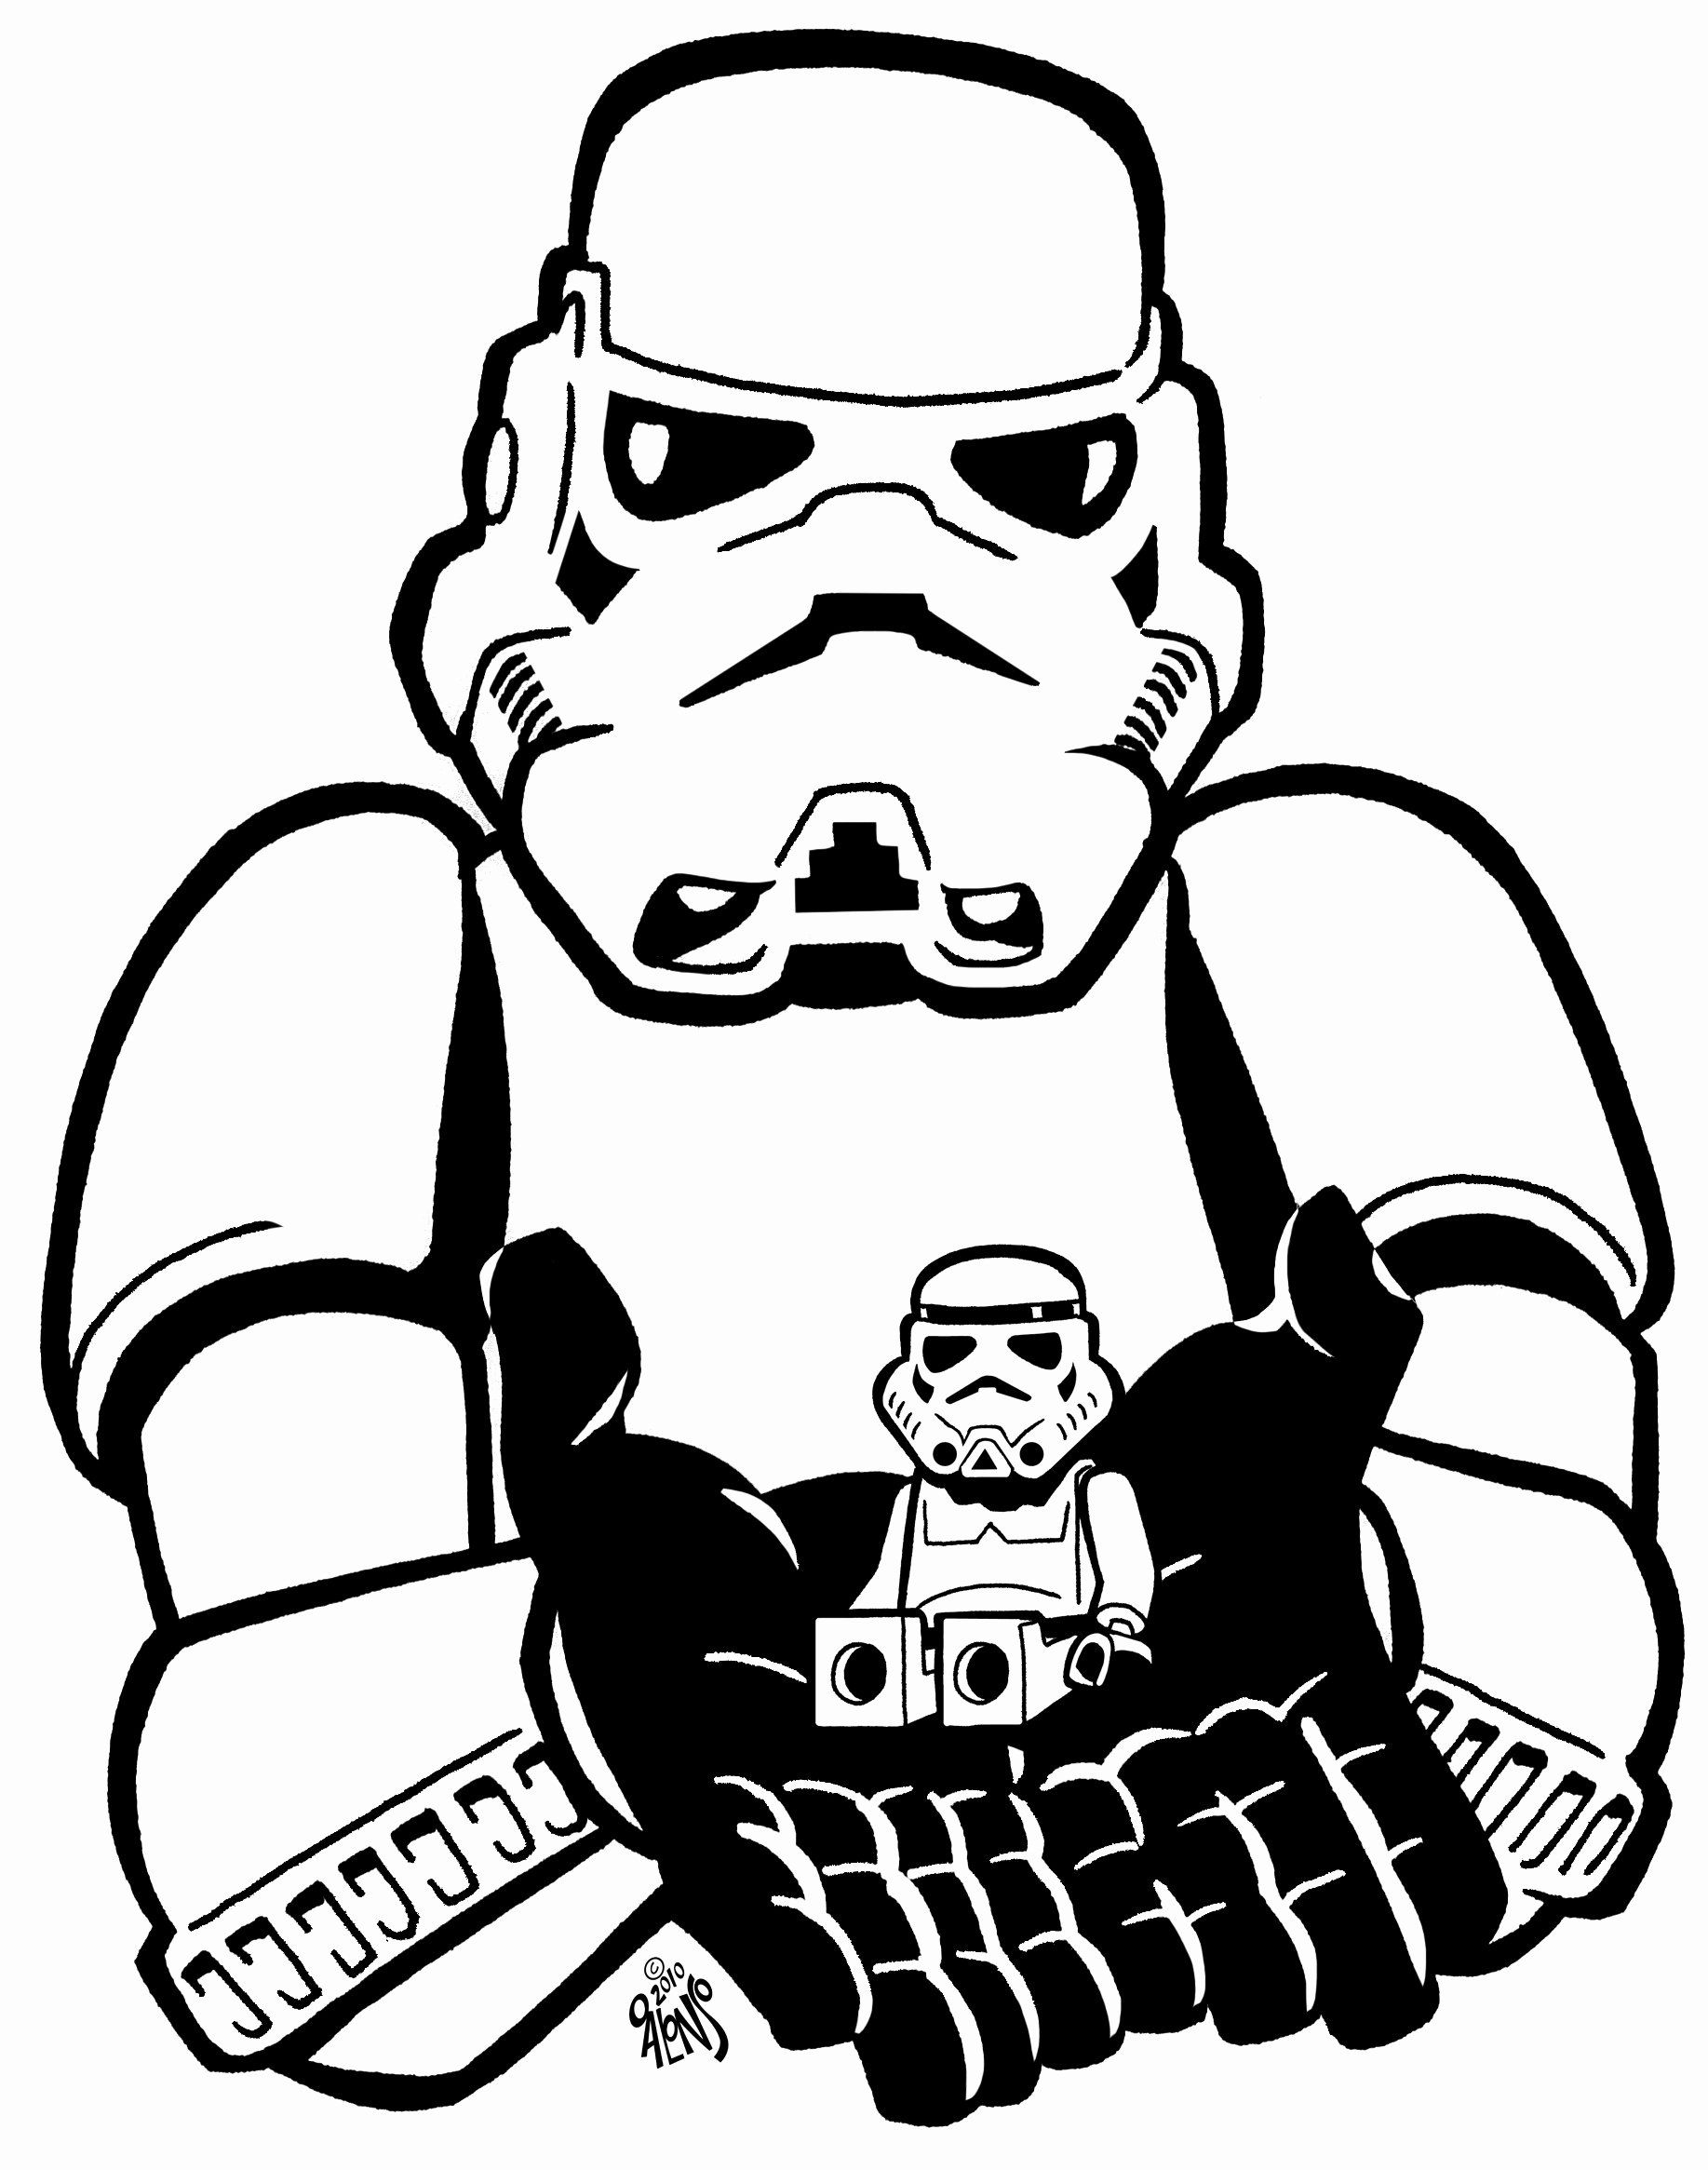 Storm Trooper Coloring Page Inspirational Stormtrooper Helmet